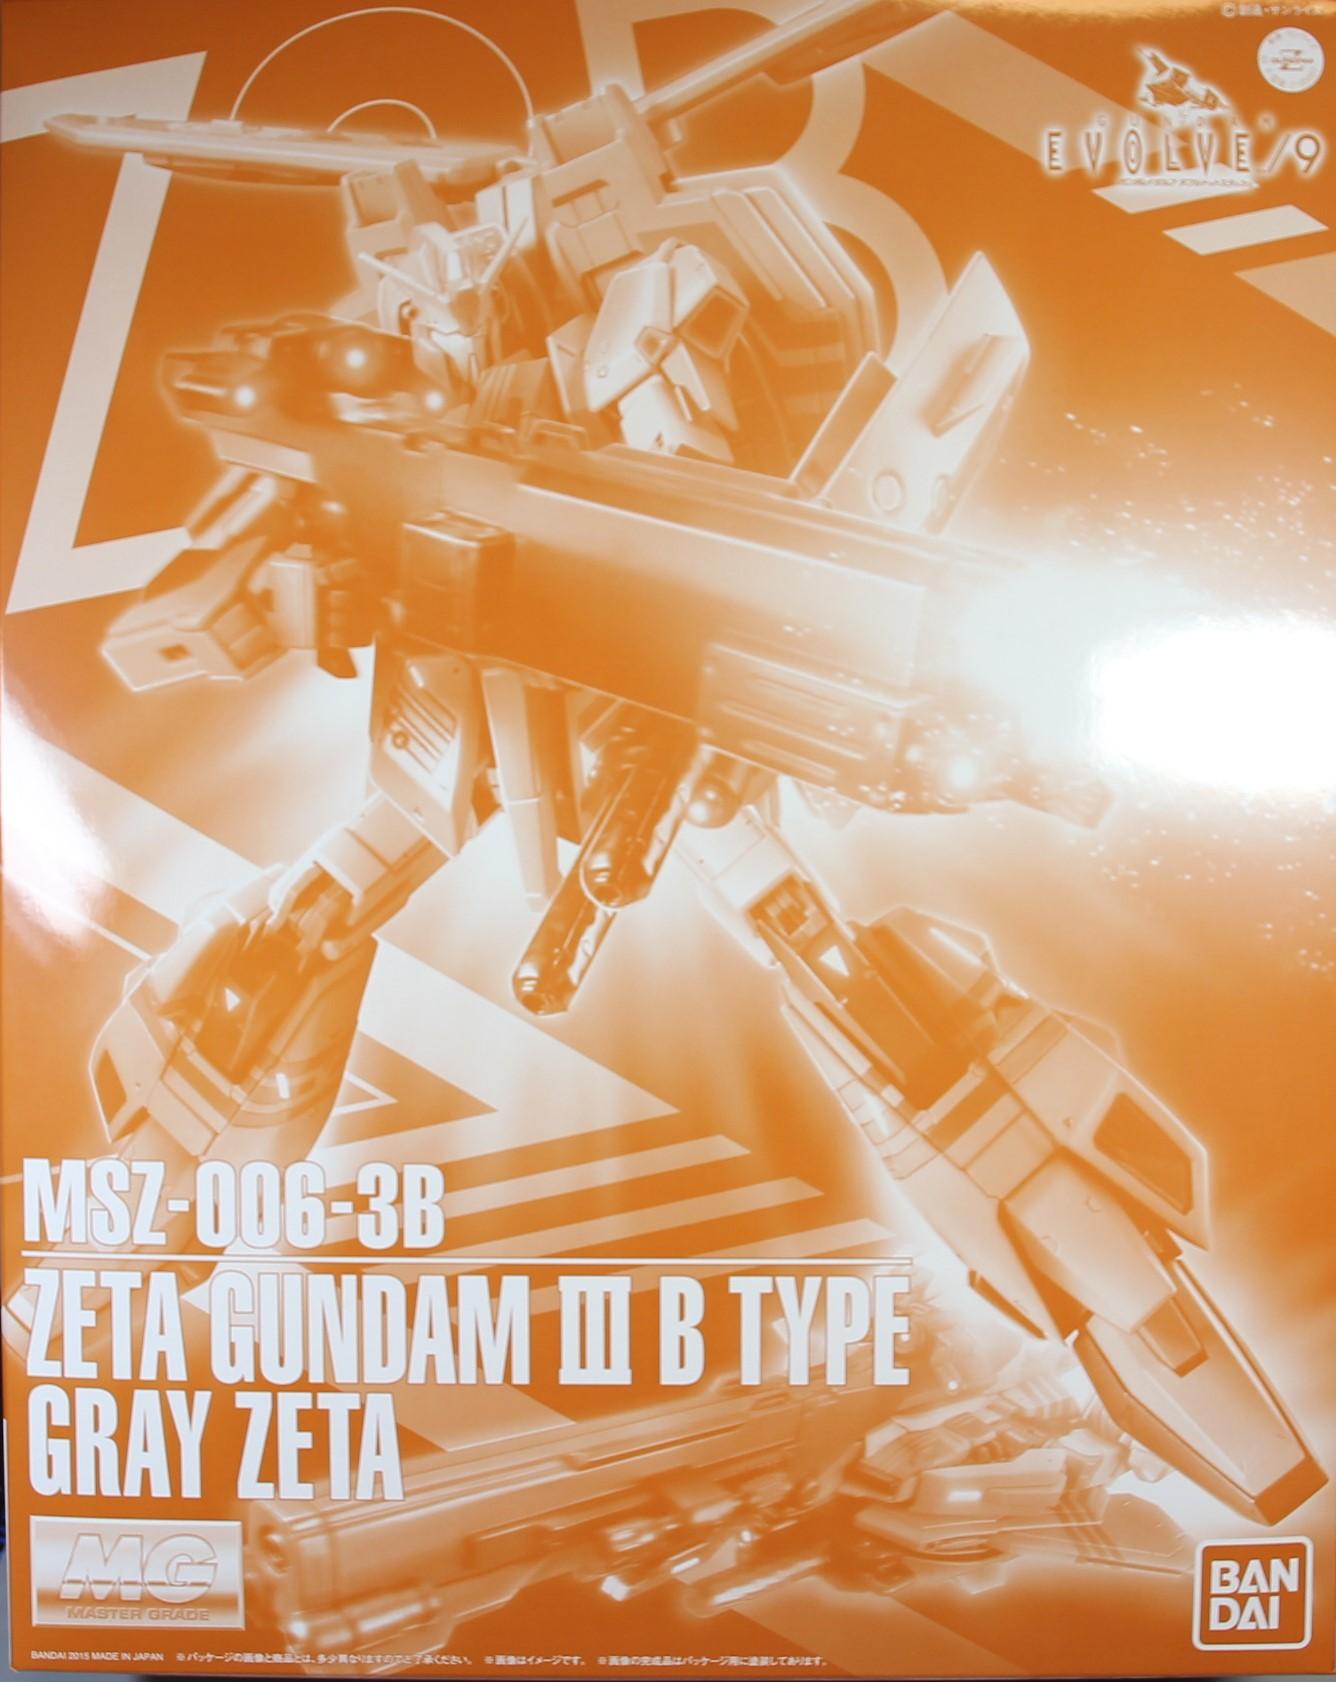 MG-GRAY_ZETA-1.jpg